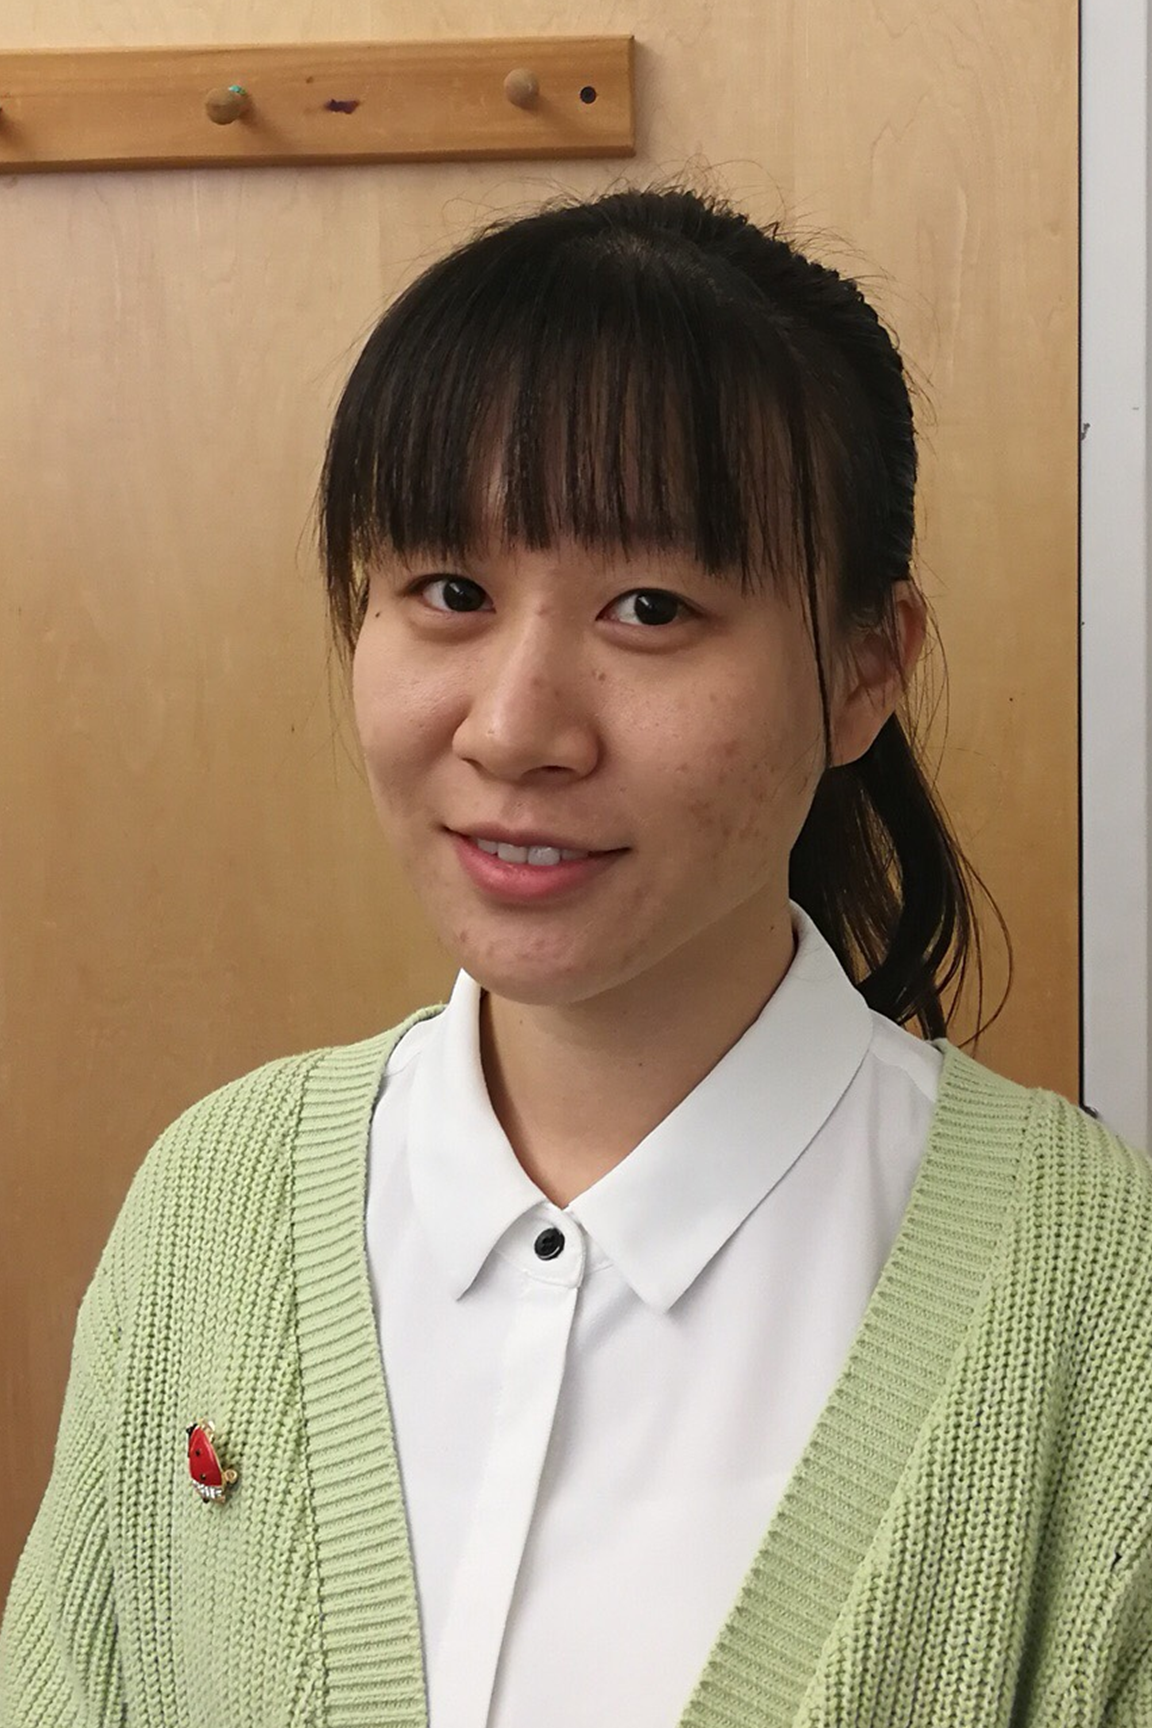 Xiang Li Integrated Applied Mathematics PhD Student